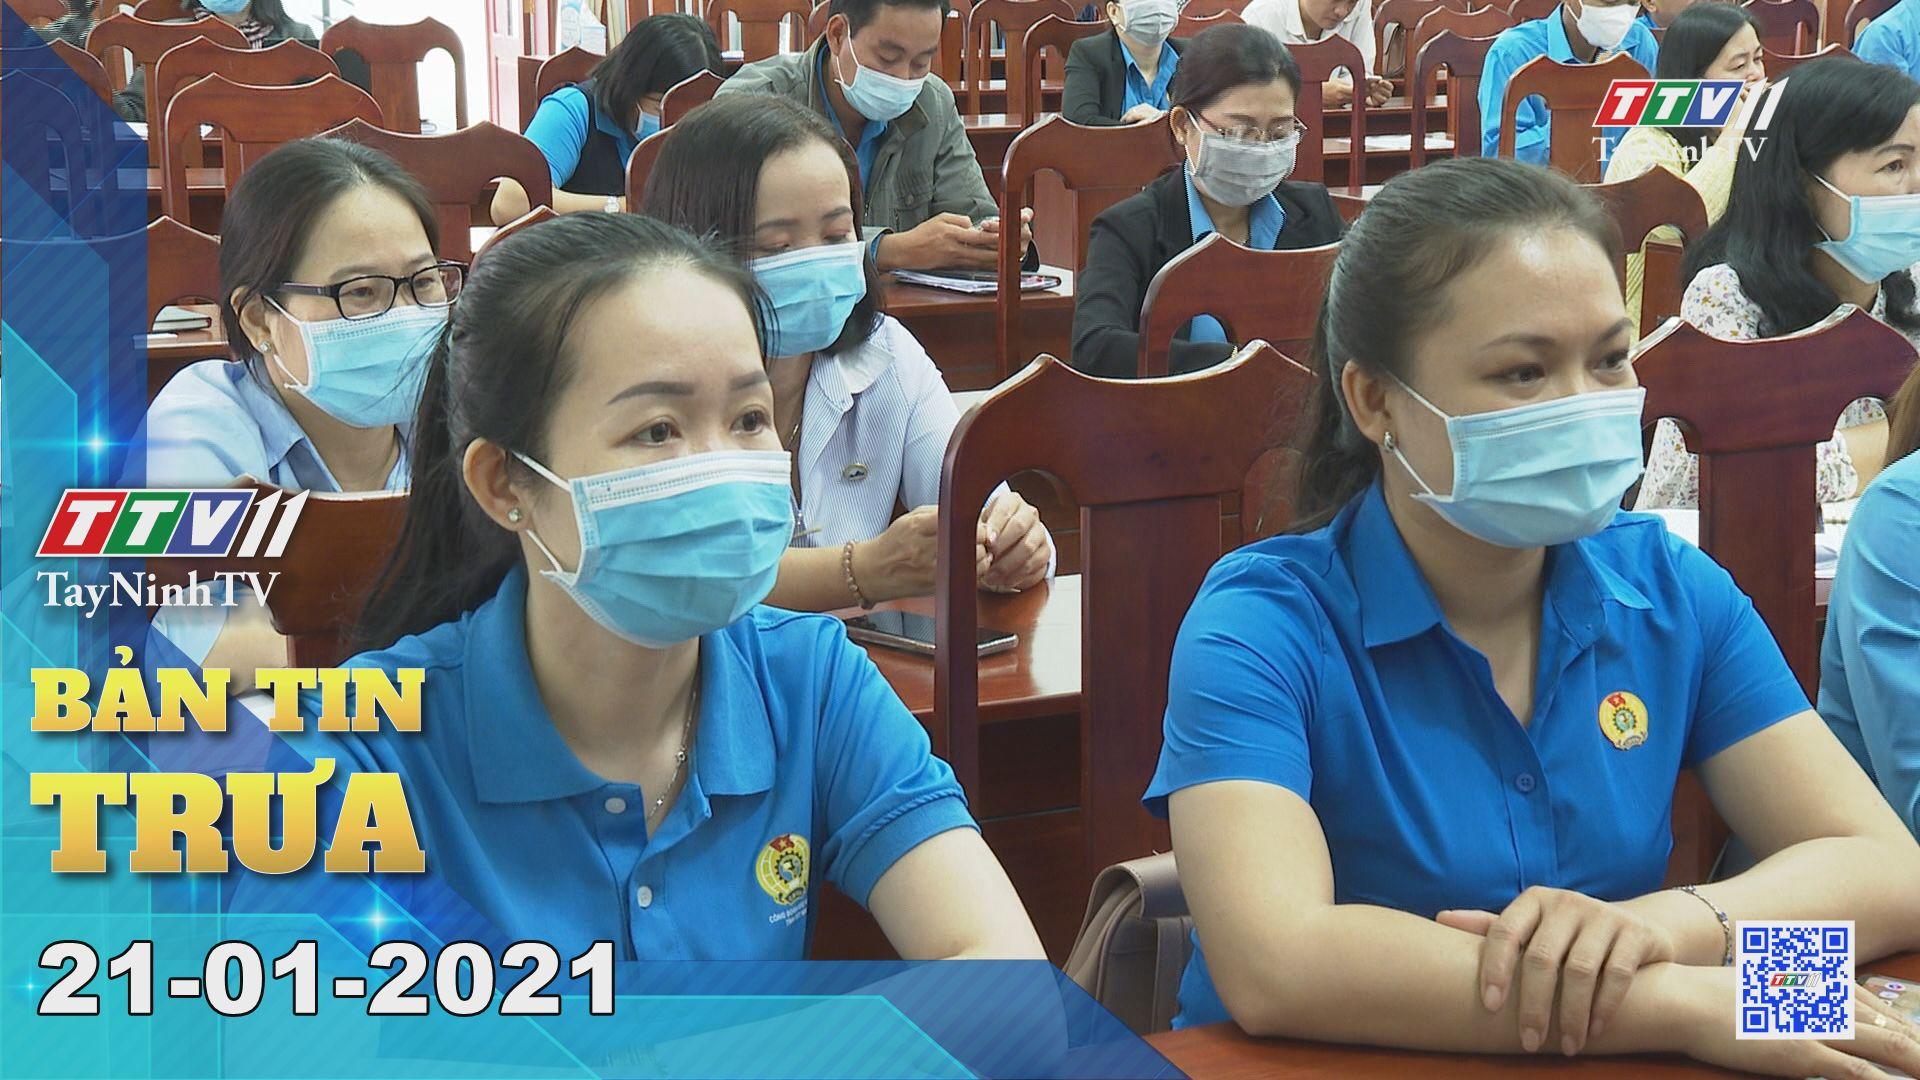 Bản tin trưa 21-01-2021 | Tin tức hôm nay | TayNinhTV